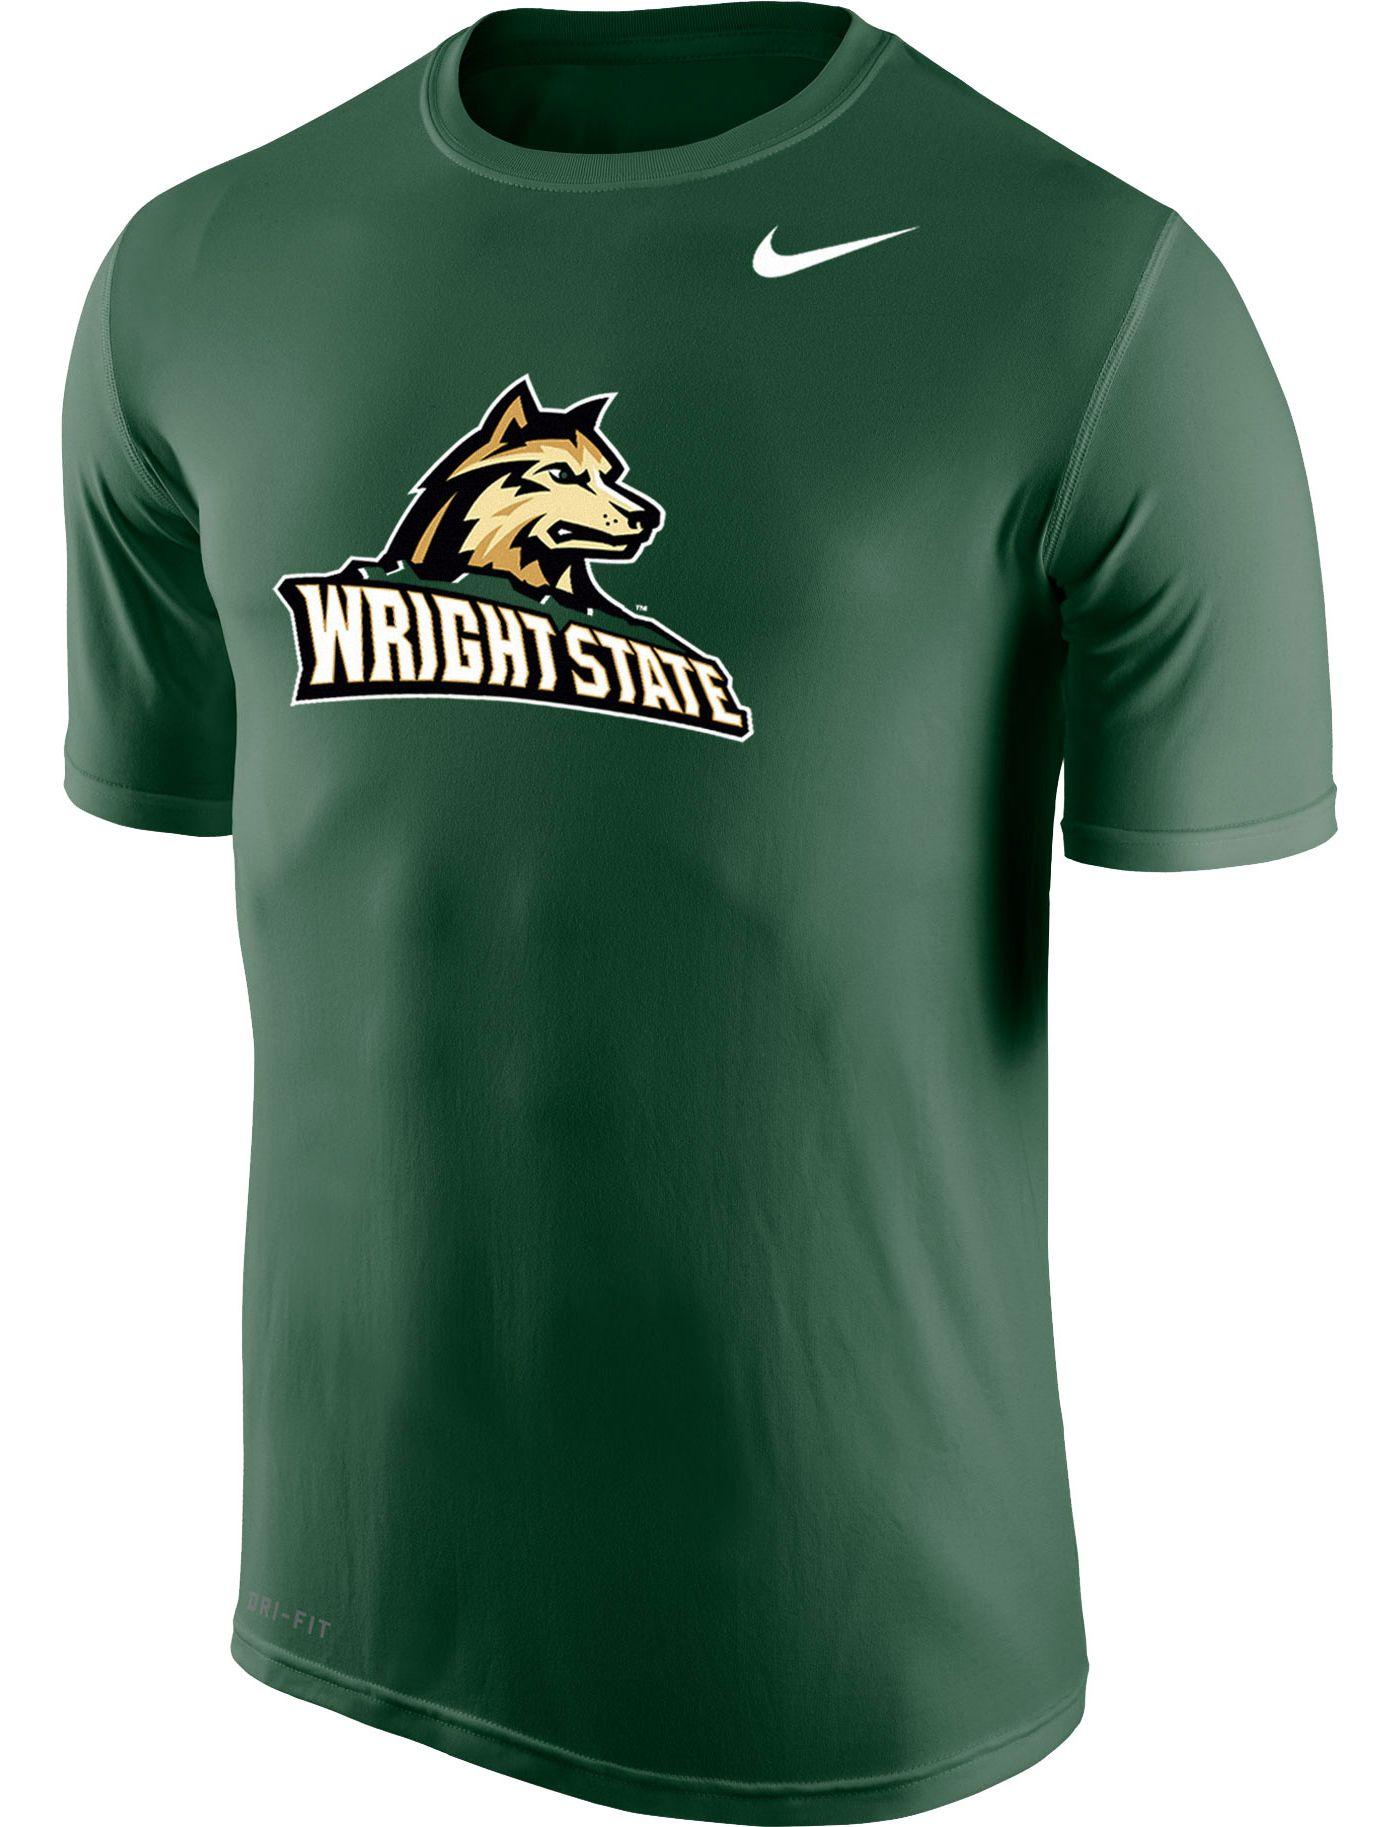 Nike Men's Wright State Raiders Green Logo Legend T-Shirt